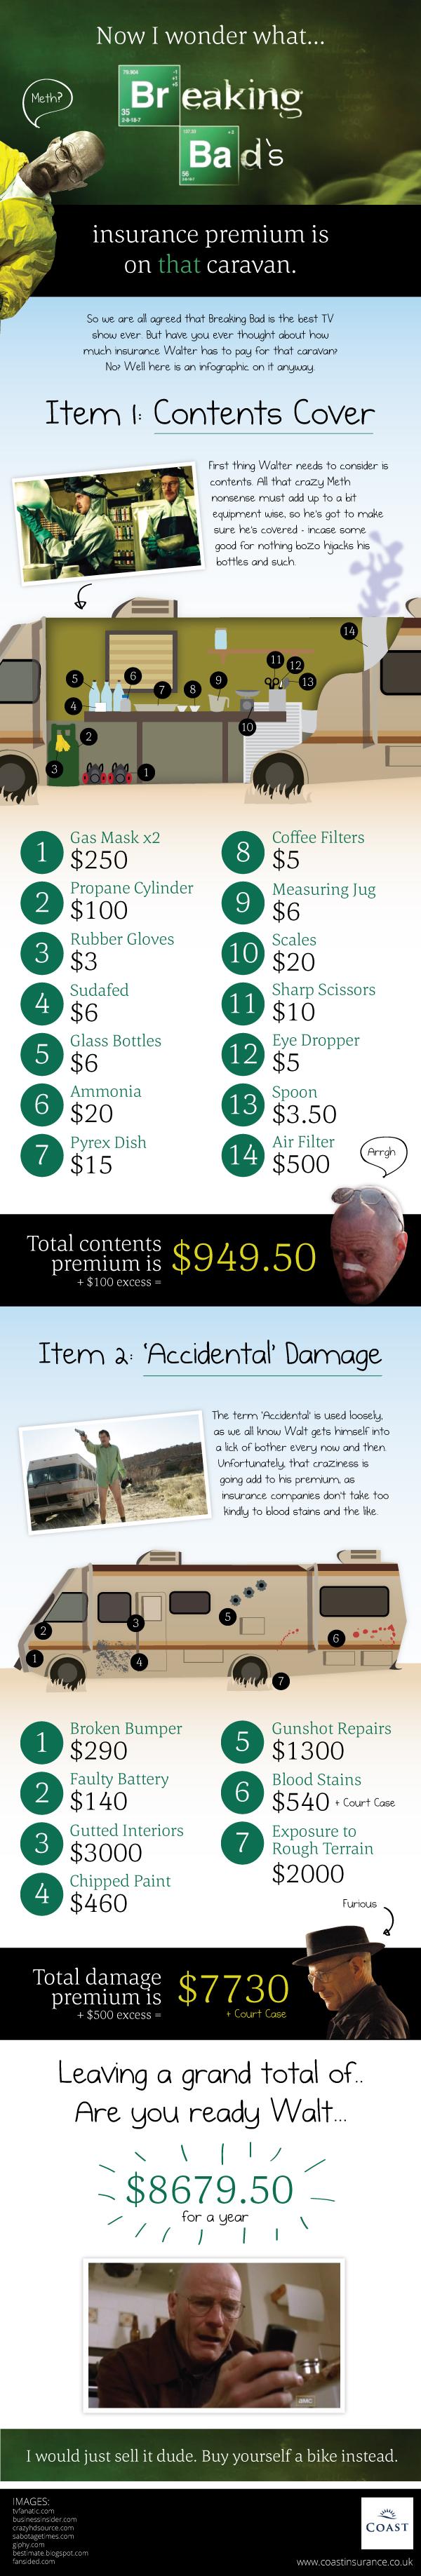 Breaking Bad infographic